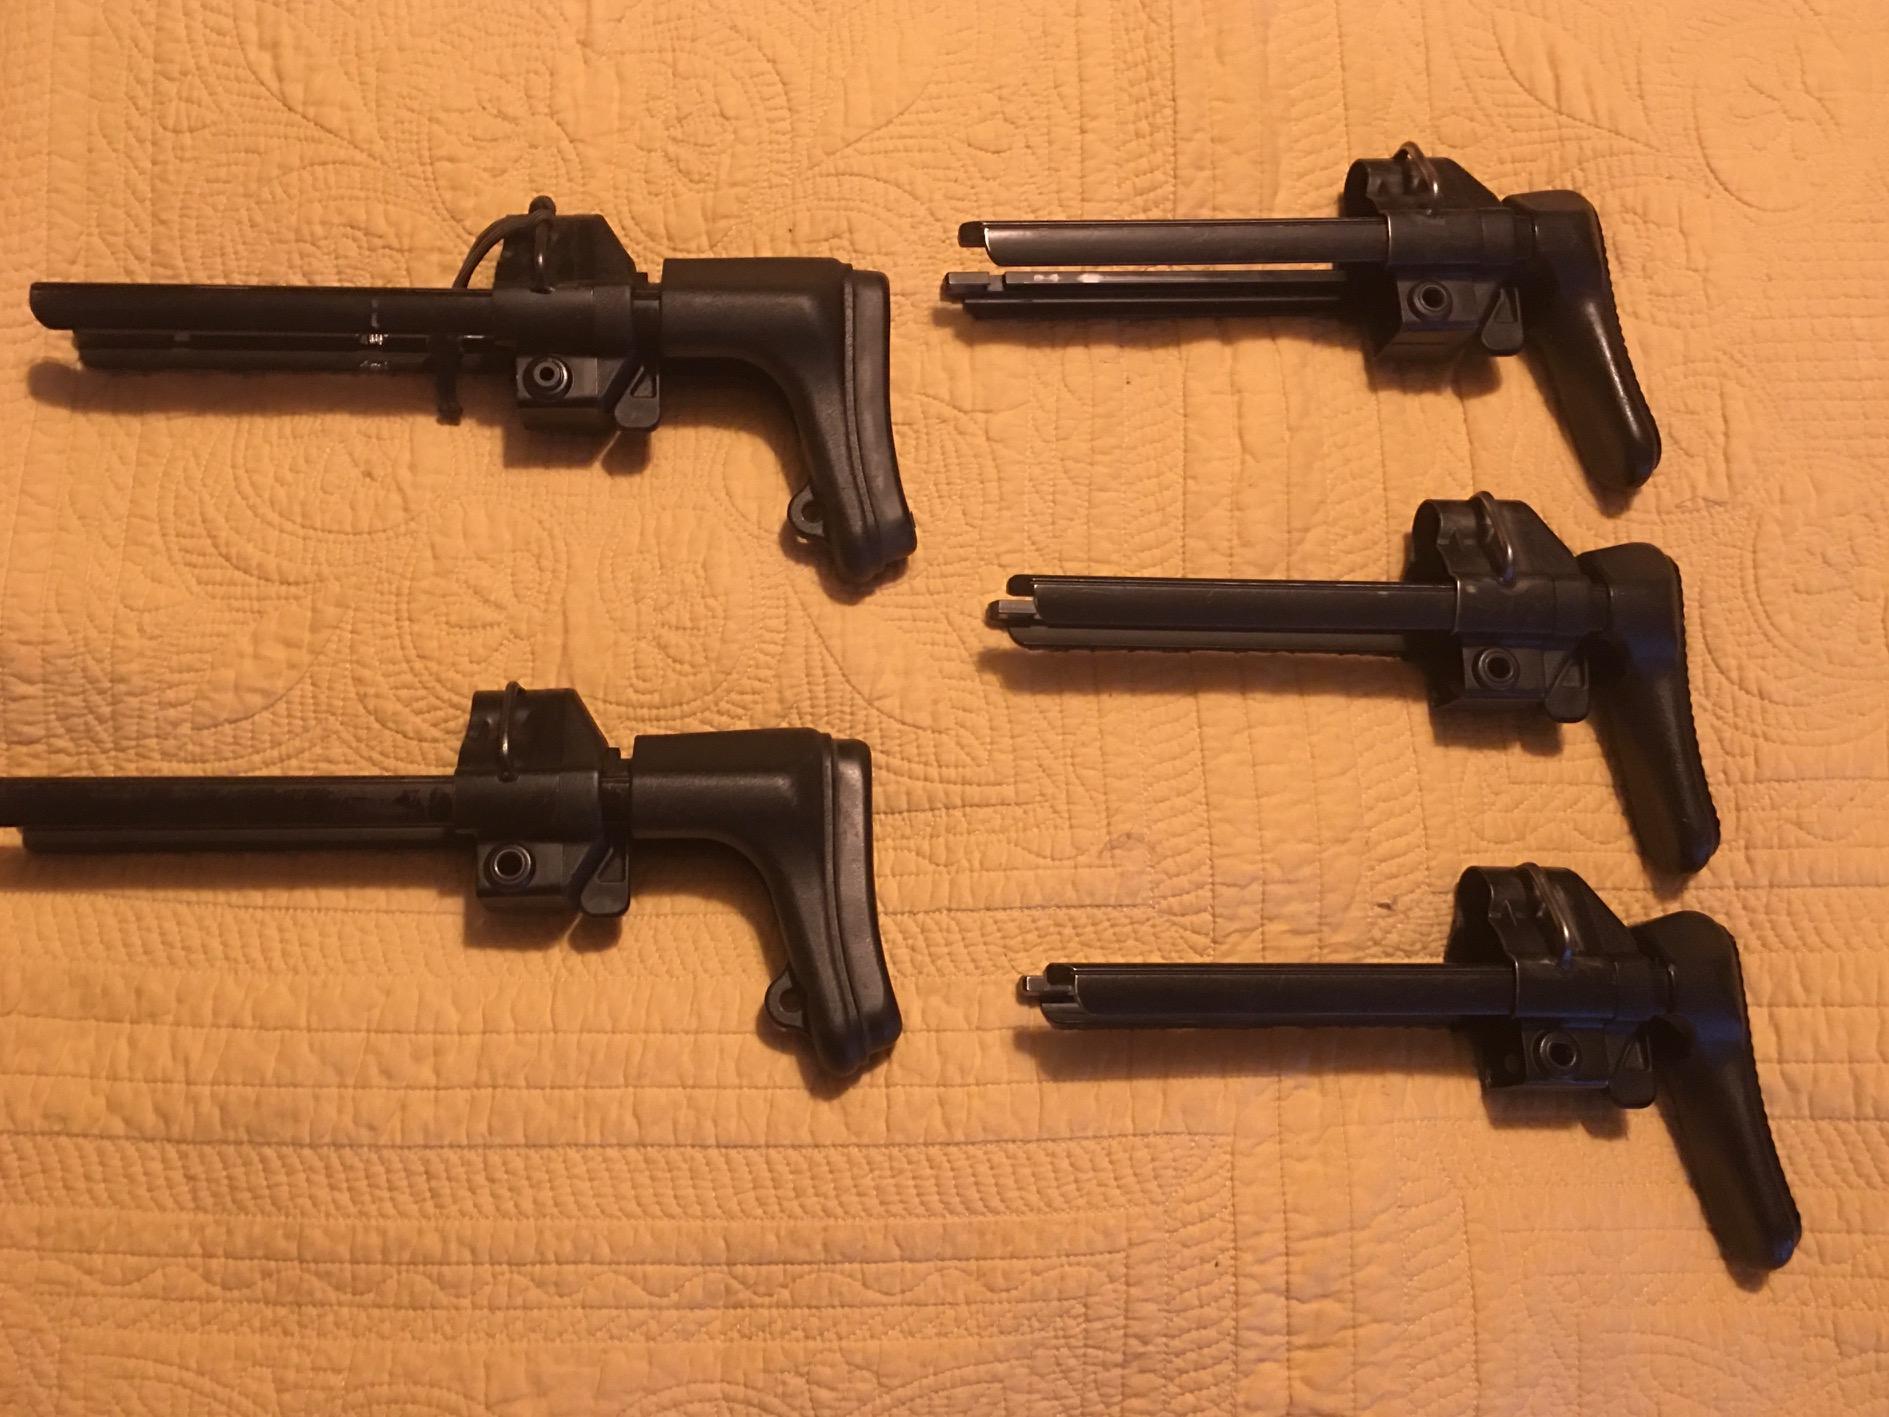 MP5 A3 to gearhead tailhook-a5ab9473-d006-470e-940f-78bea6fde7c4_1579487791139.jpeg